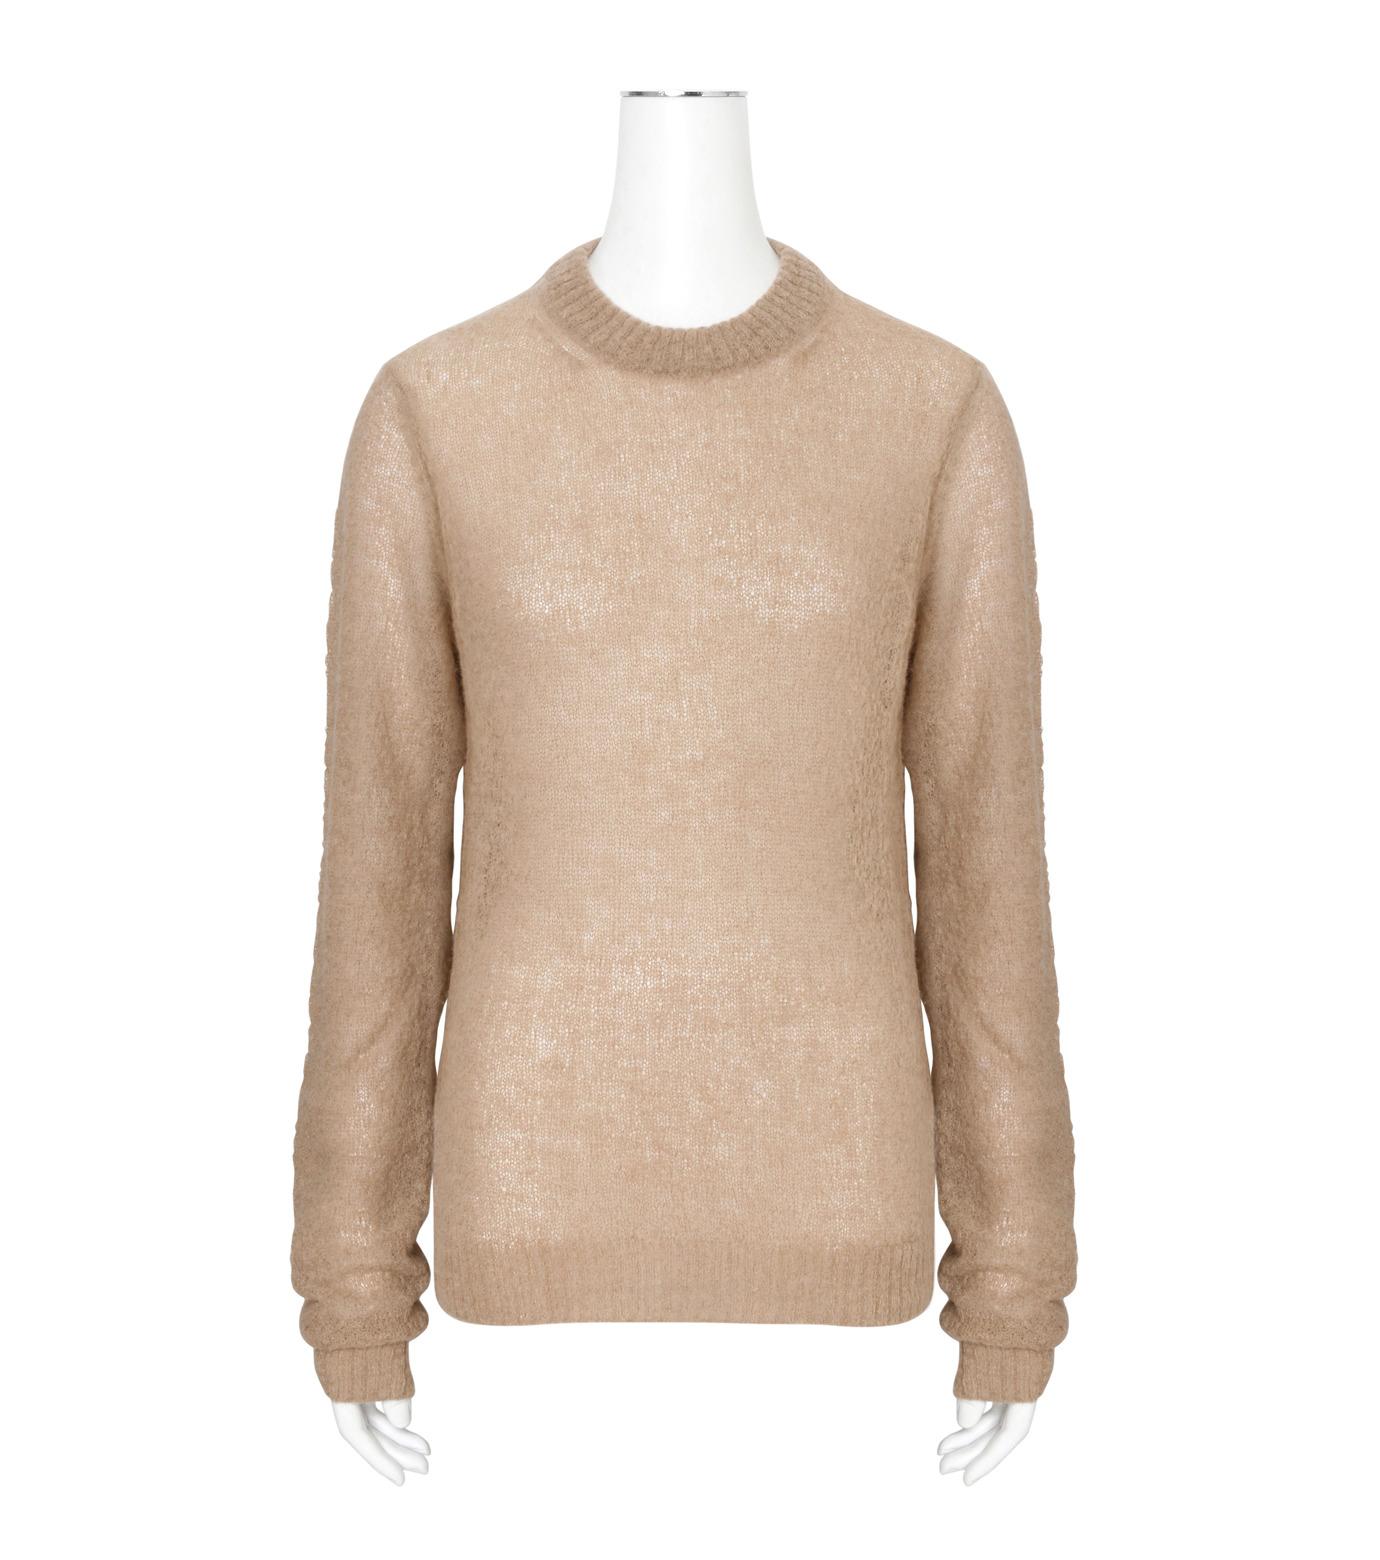 ACNE STUDIOS(アクネ ストゥディオズ)のAlpaca Extra LS Pullover-BEIGE(ニット/knit)-19F166-52 拡大詳細画像1